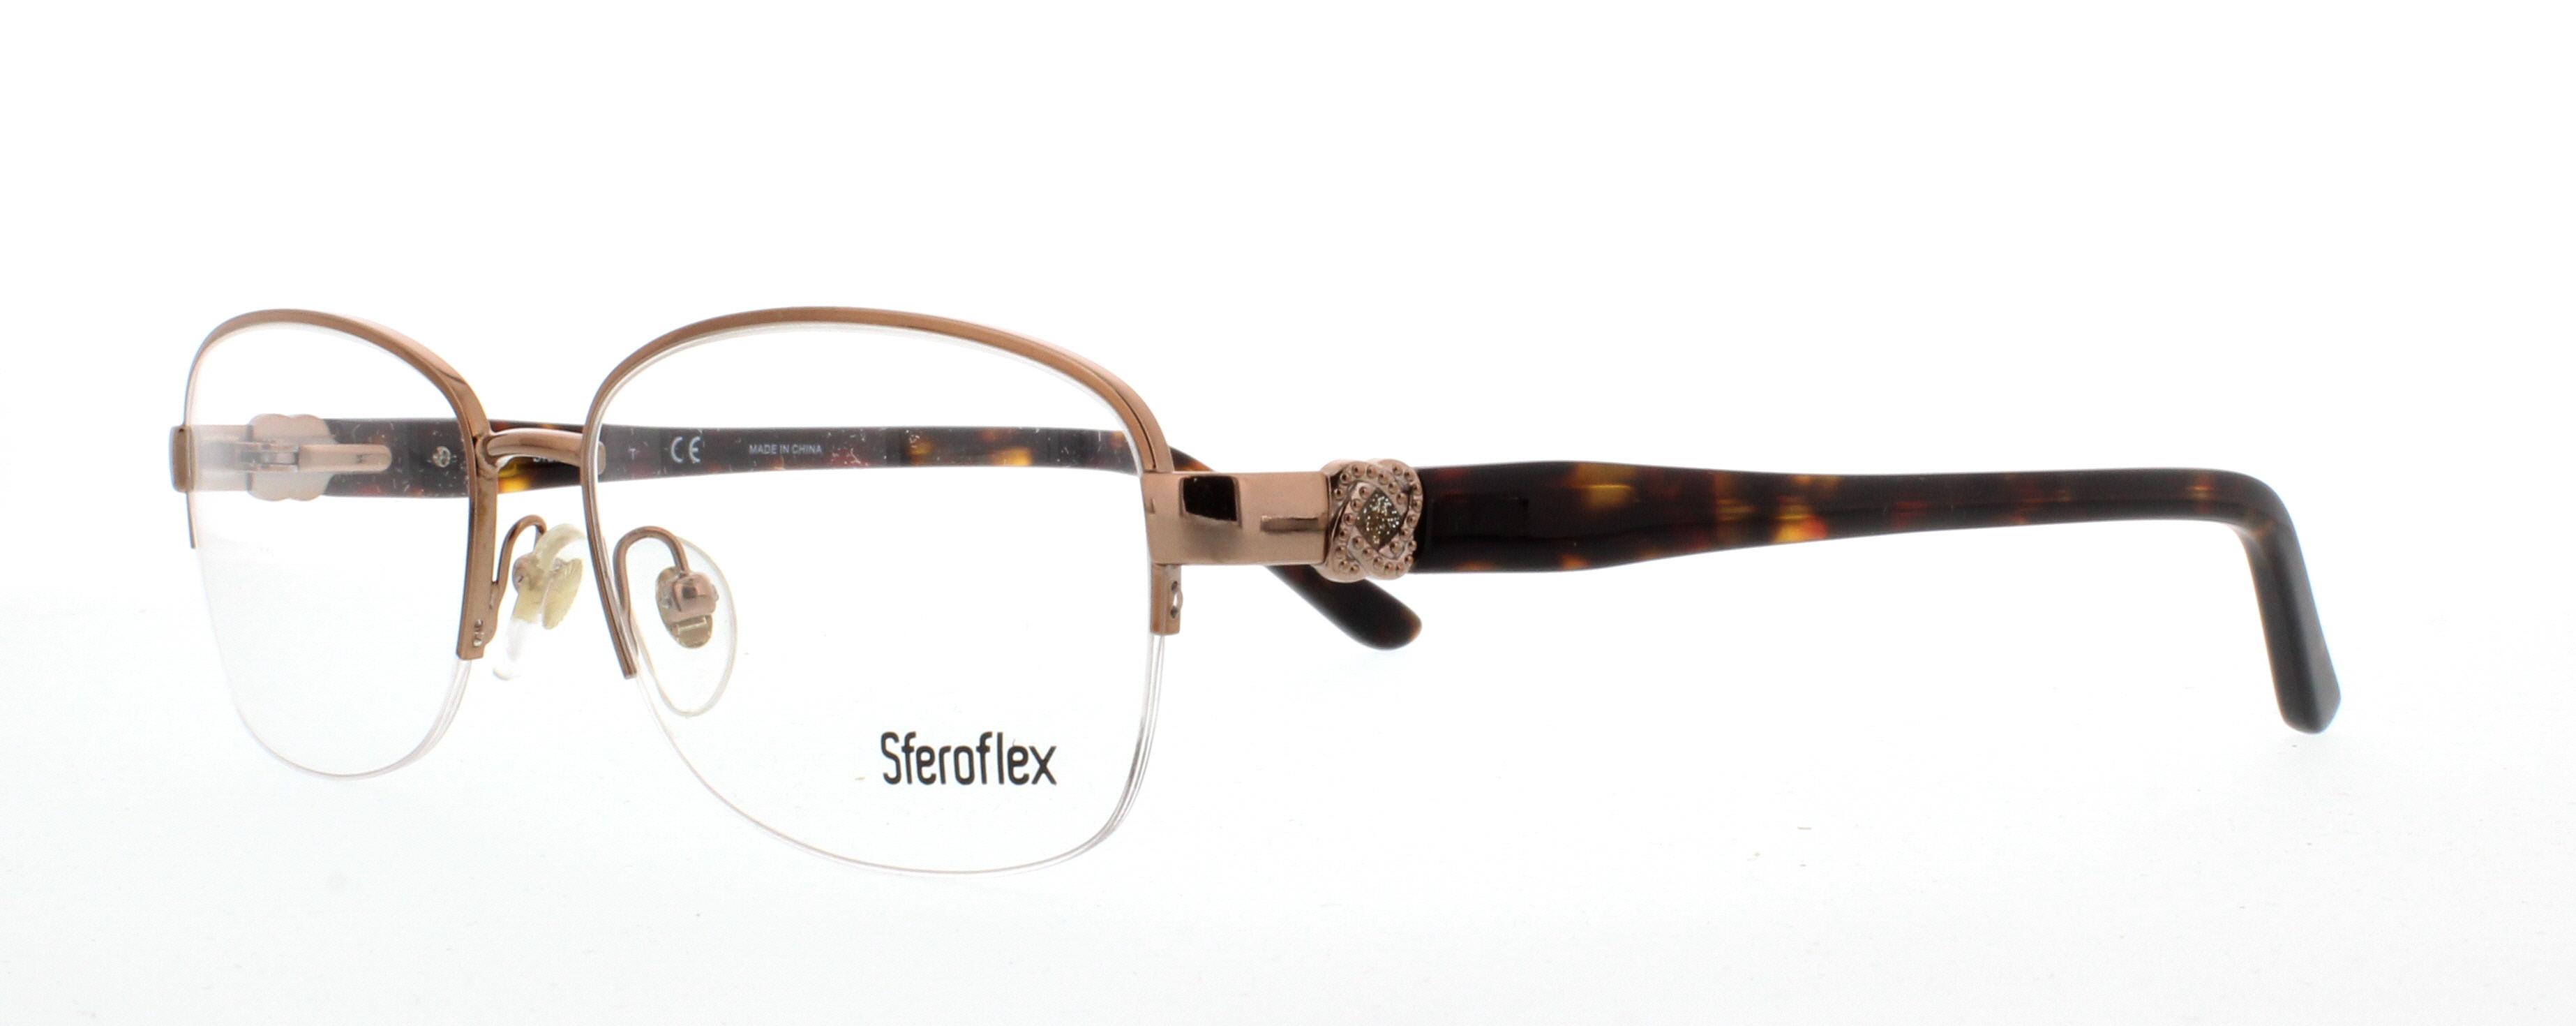 Designer Frames Outlet. Sferoflex SF2571